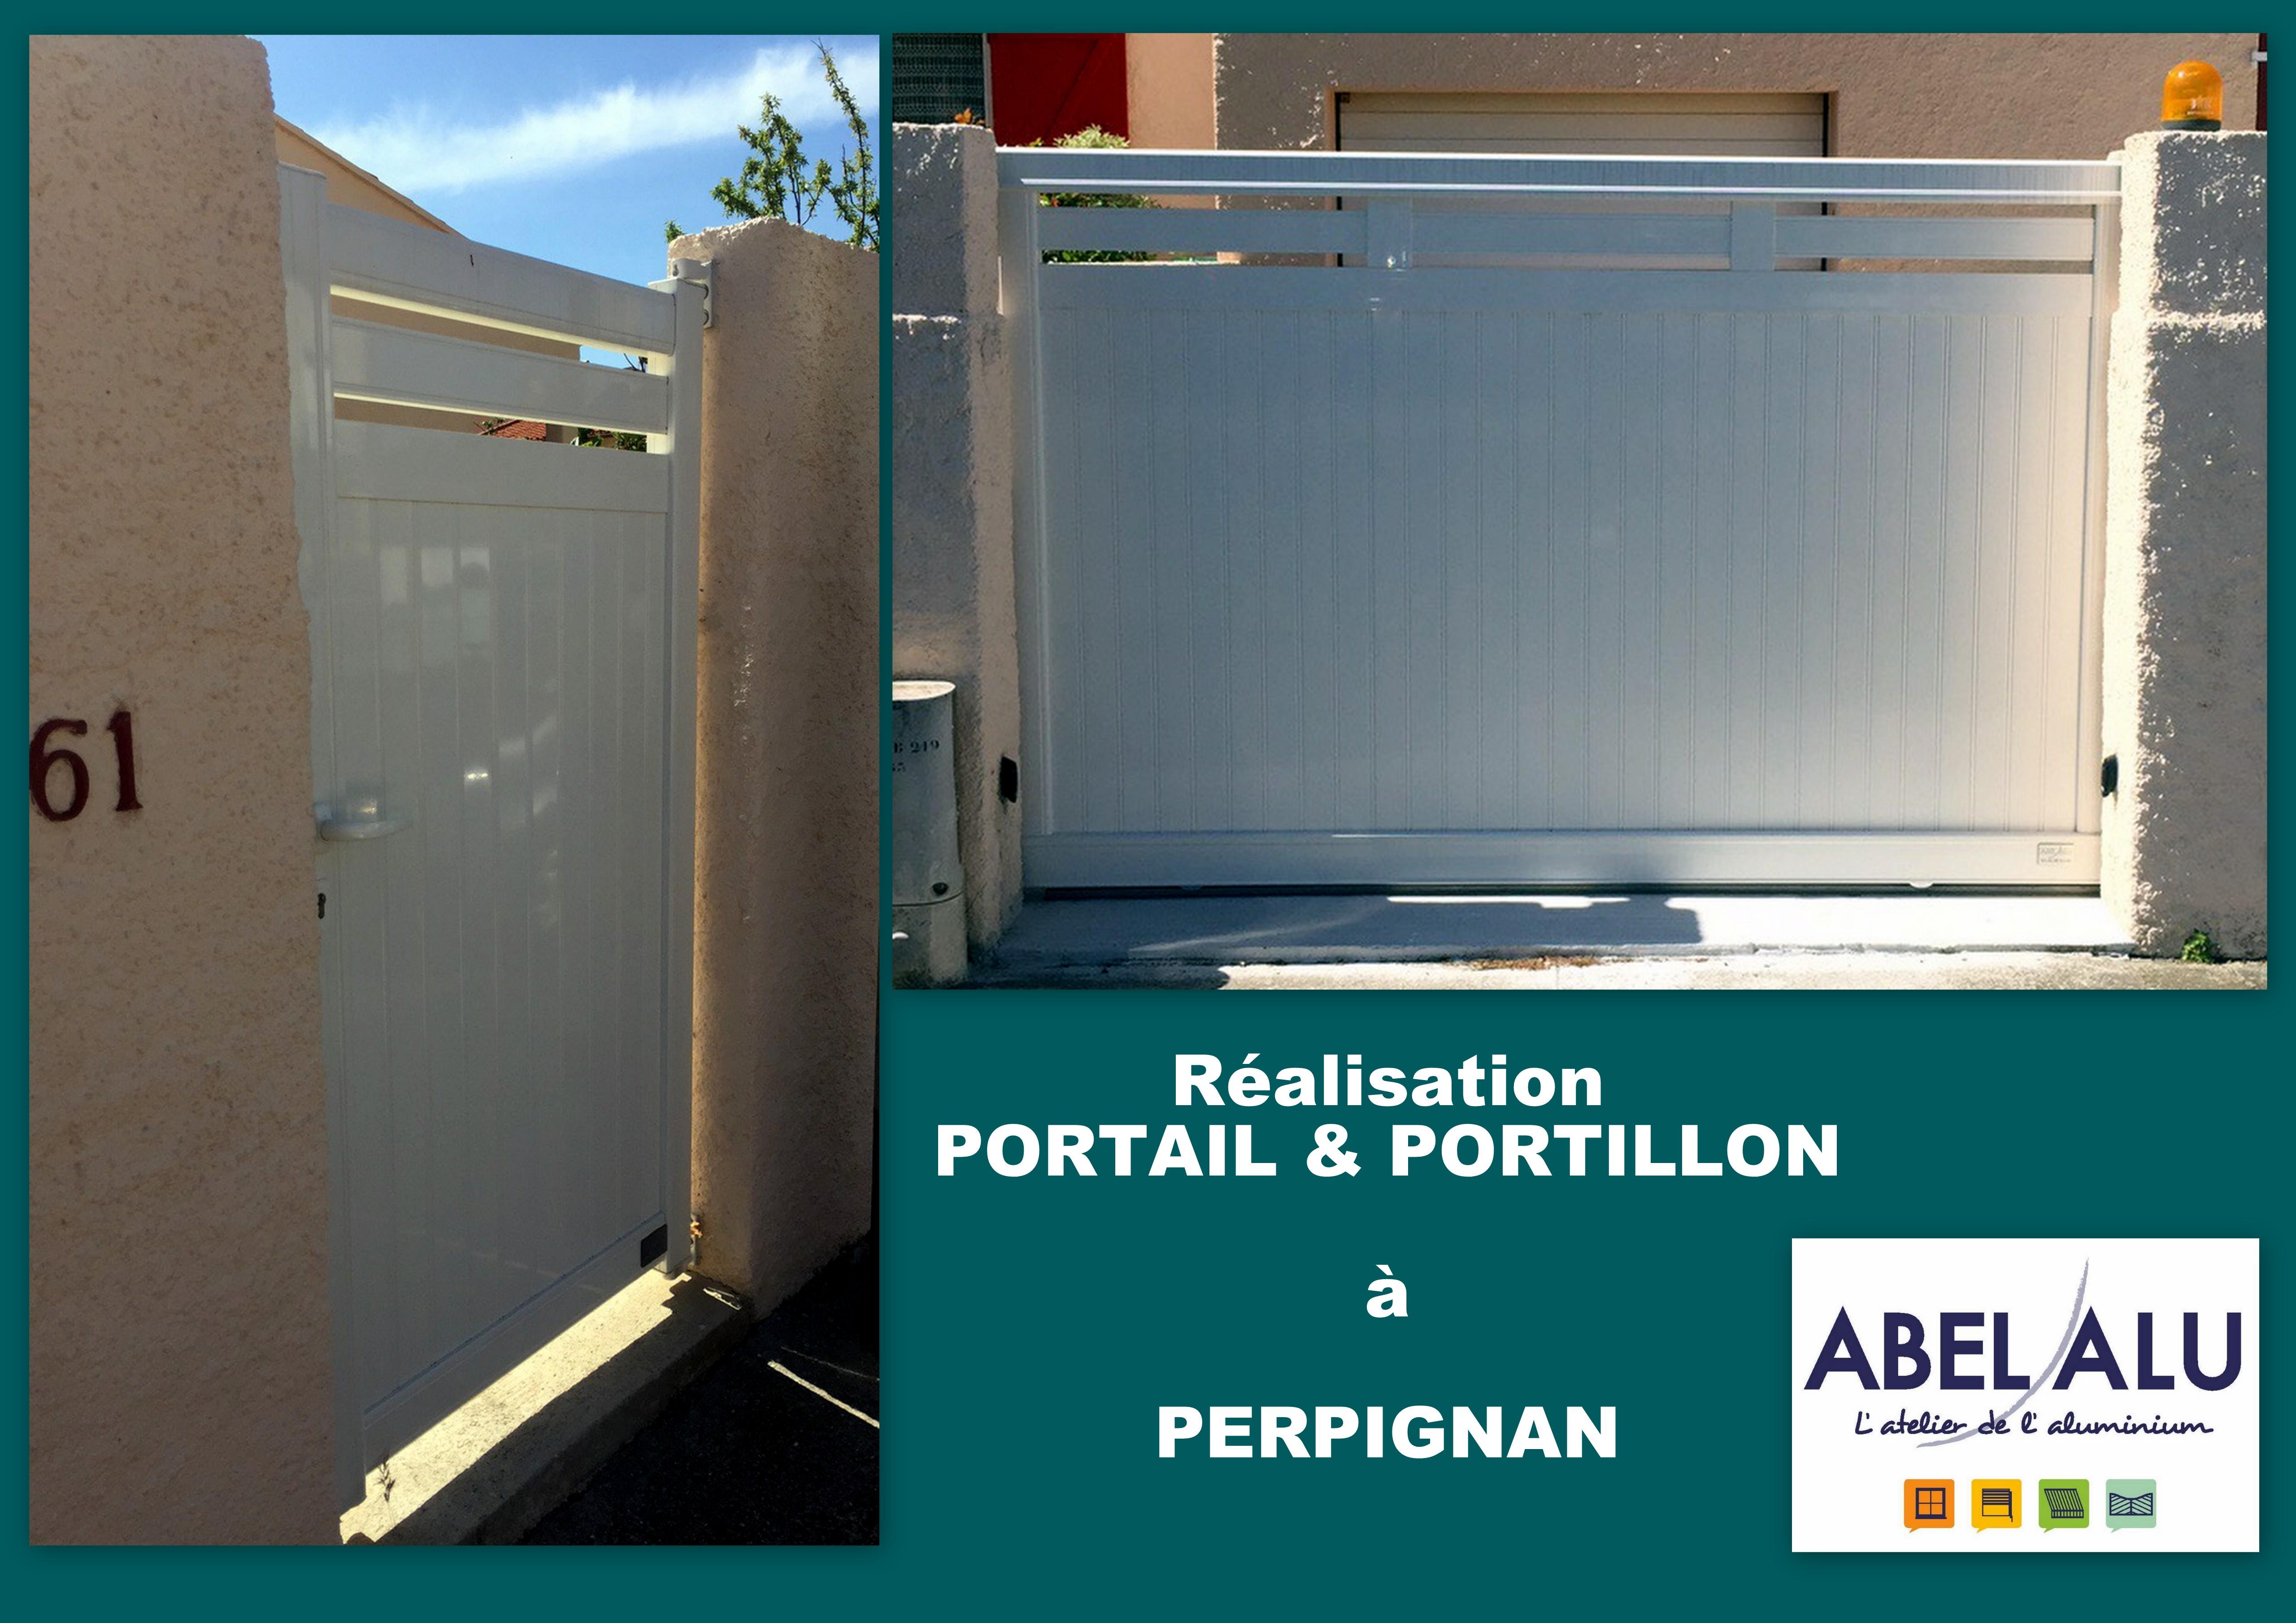 ABEL ALU - PORTAIL-PORTILLON - PERPIGNAN